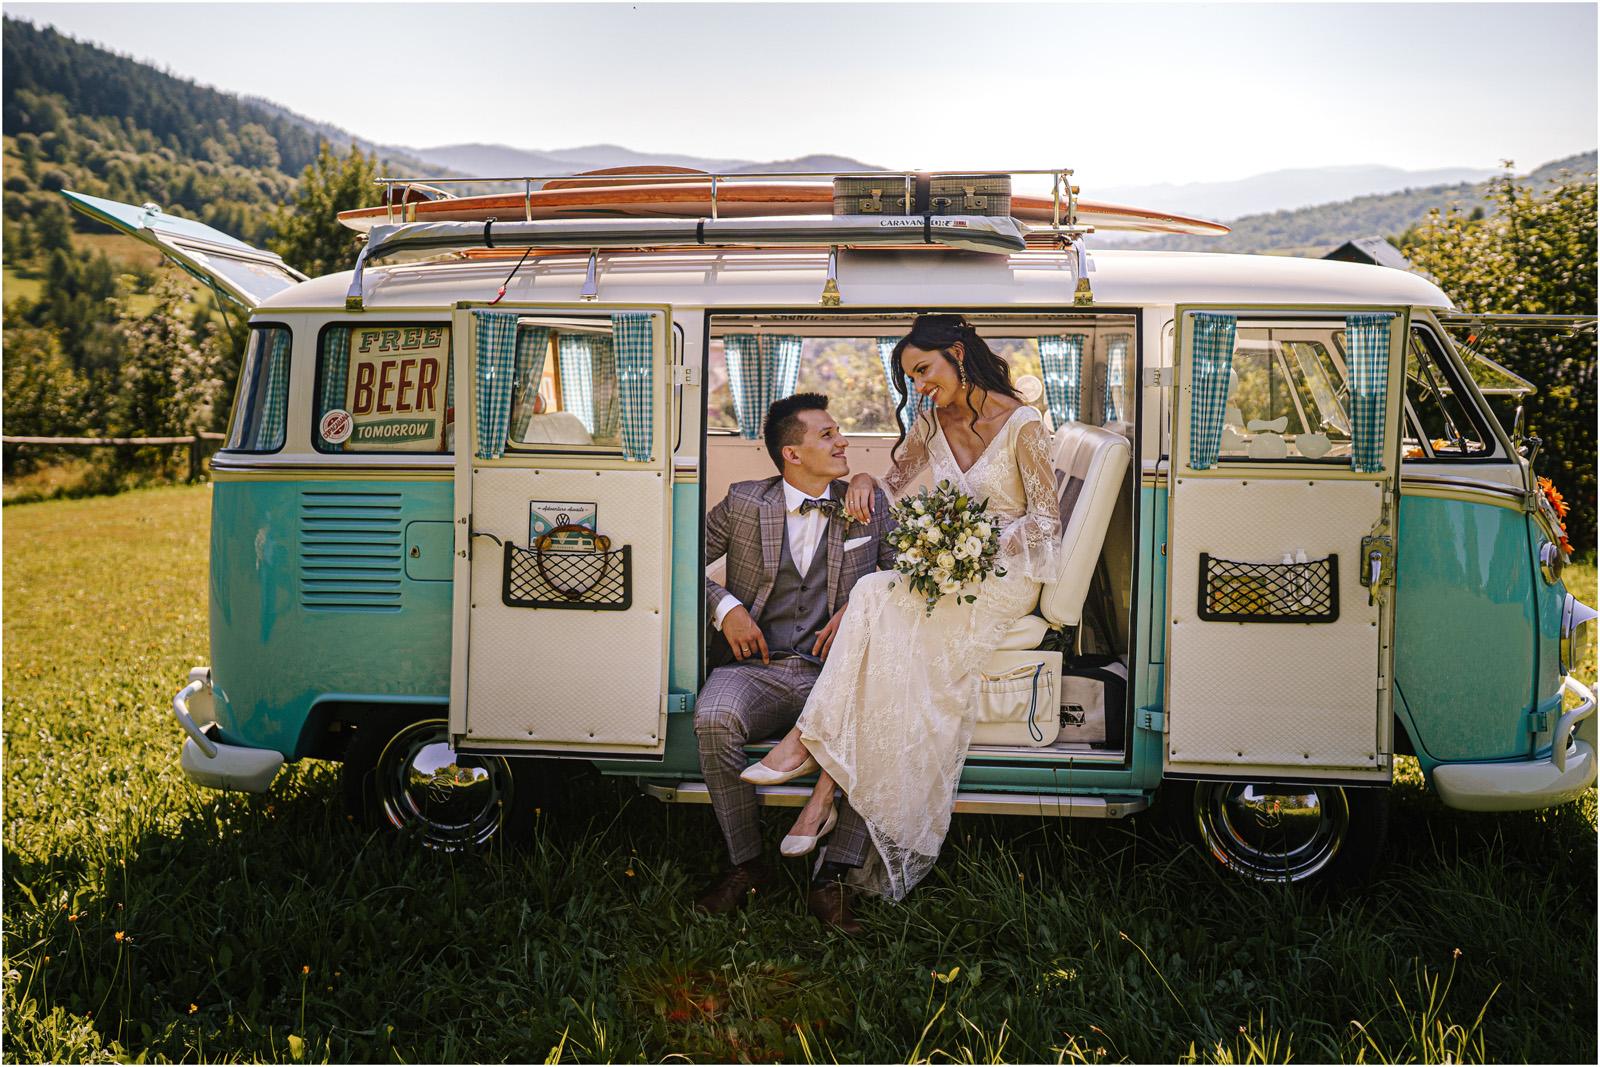 Ania & Mateusz | boho wesele w Stodole pod Kasztanami 52